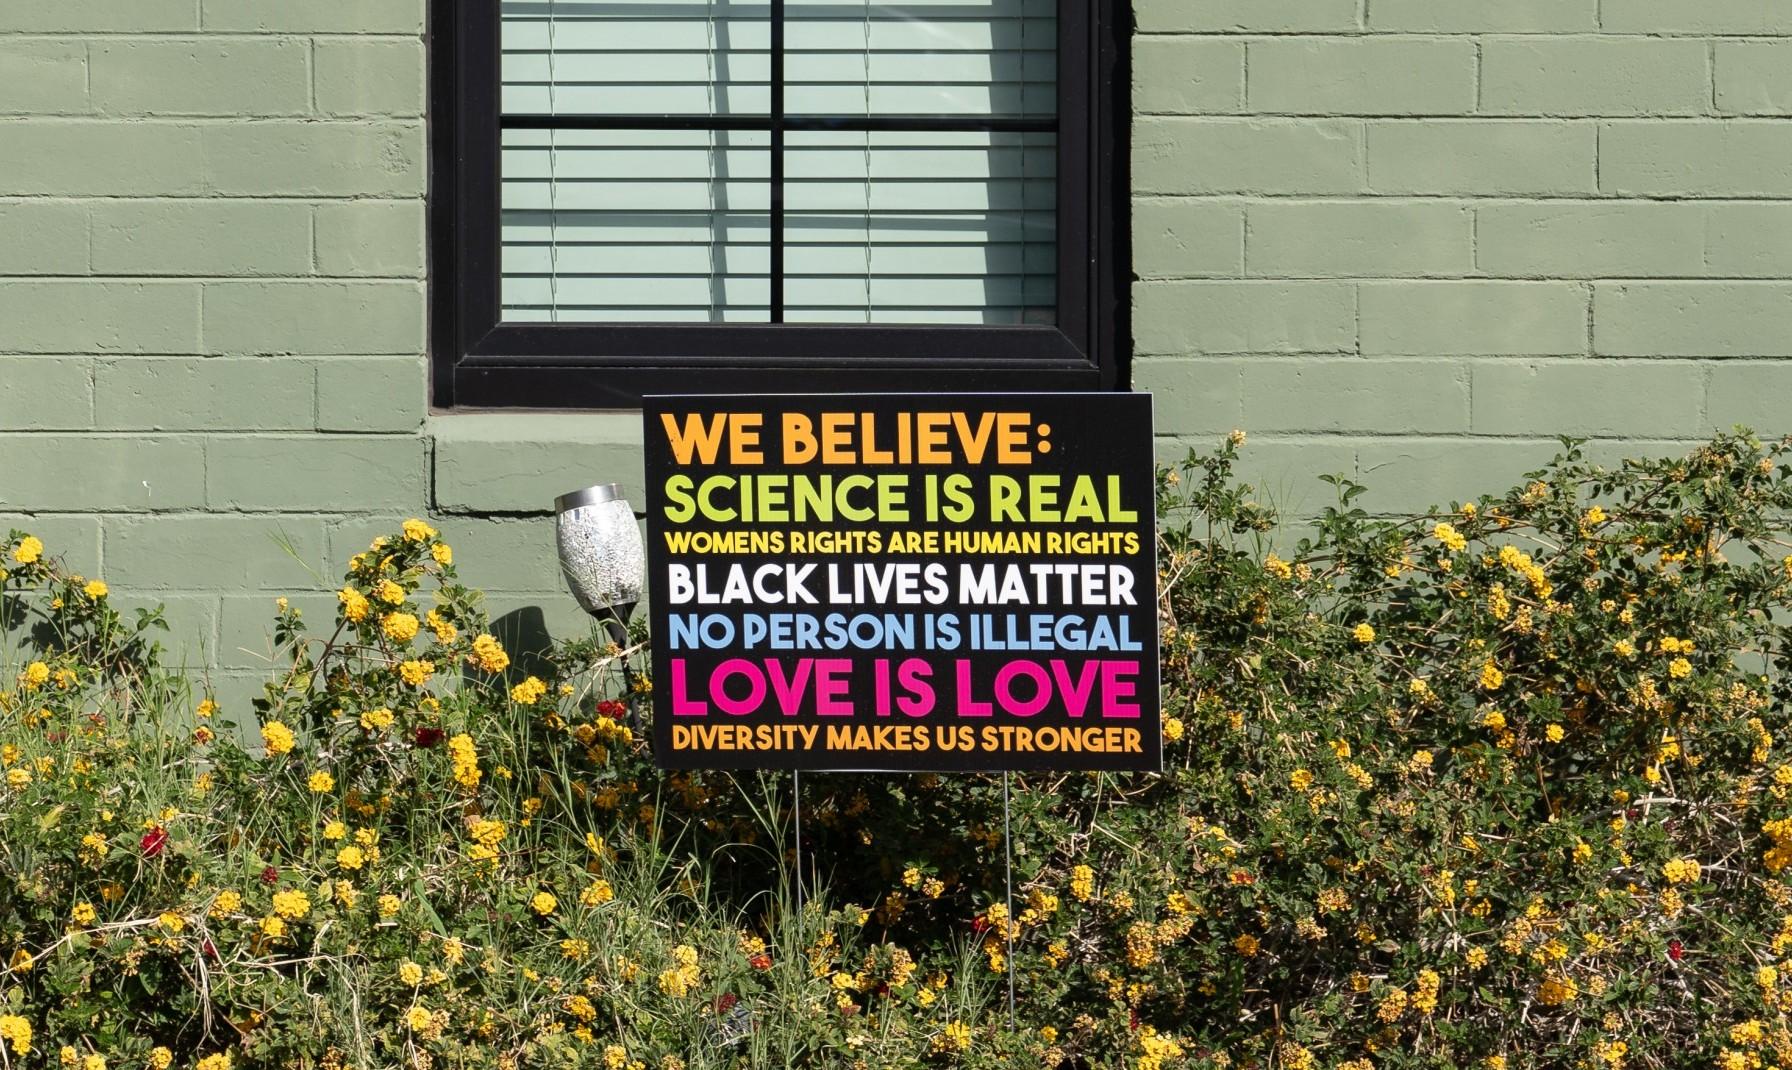 """We Believe science"" sign, Phoenix, Arizona, March 20, 2021 (Rosemarie Mosteller/Shutterstock.com) spectator.org"